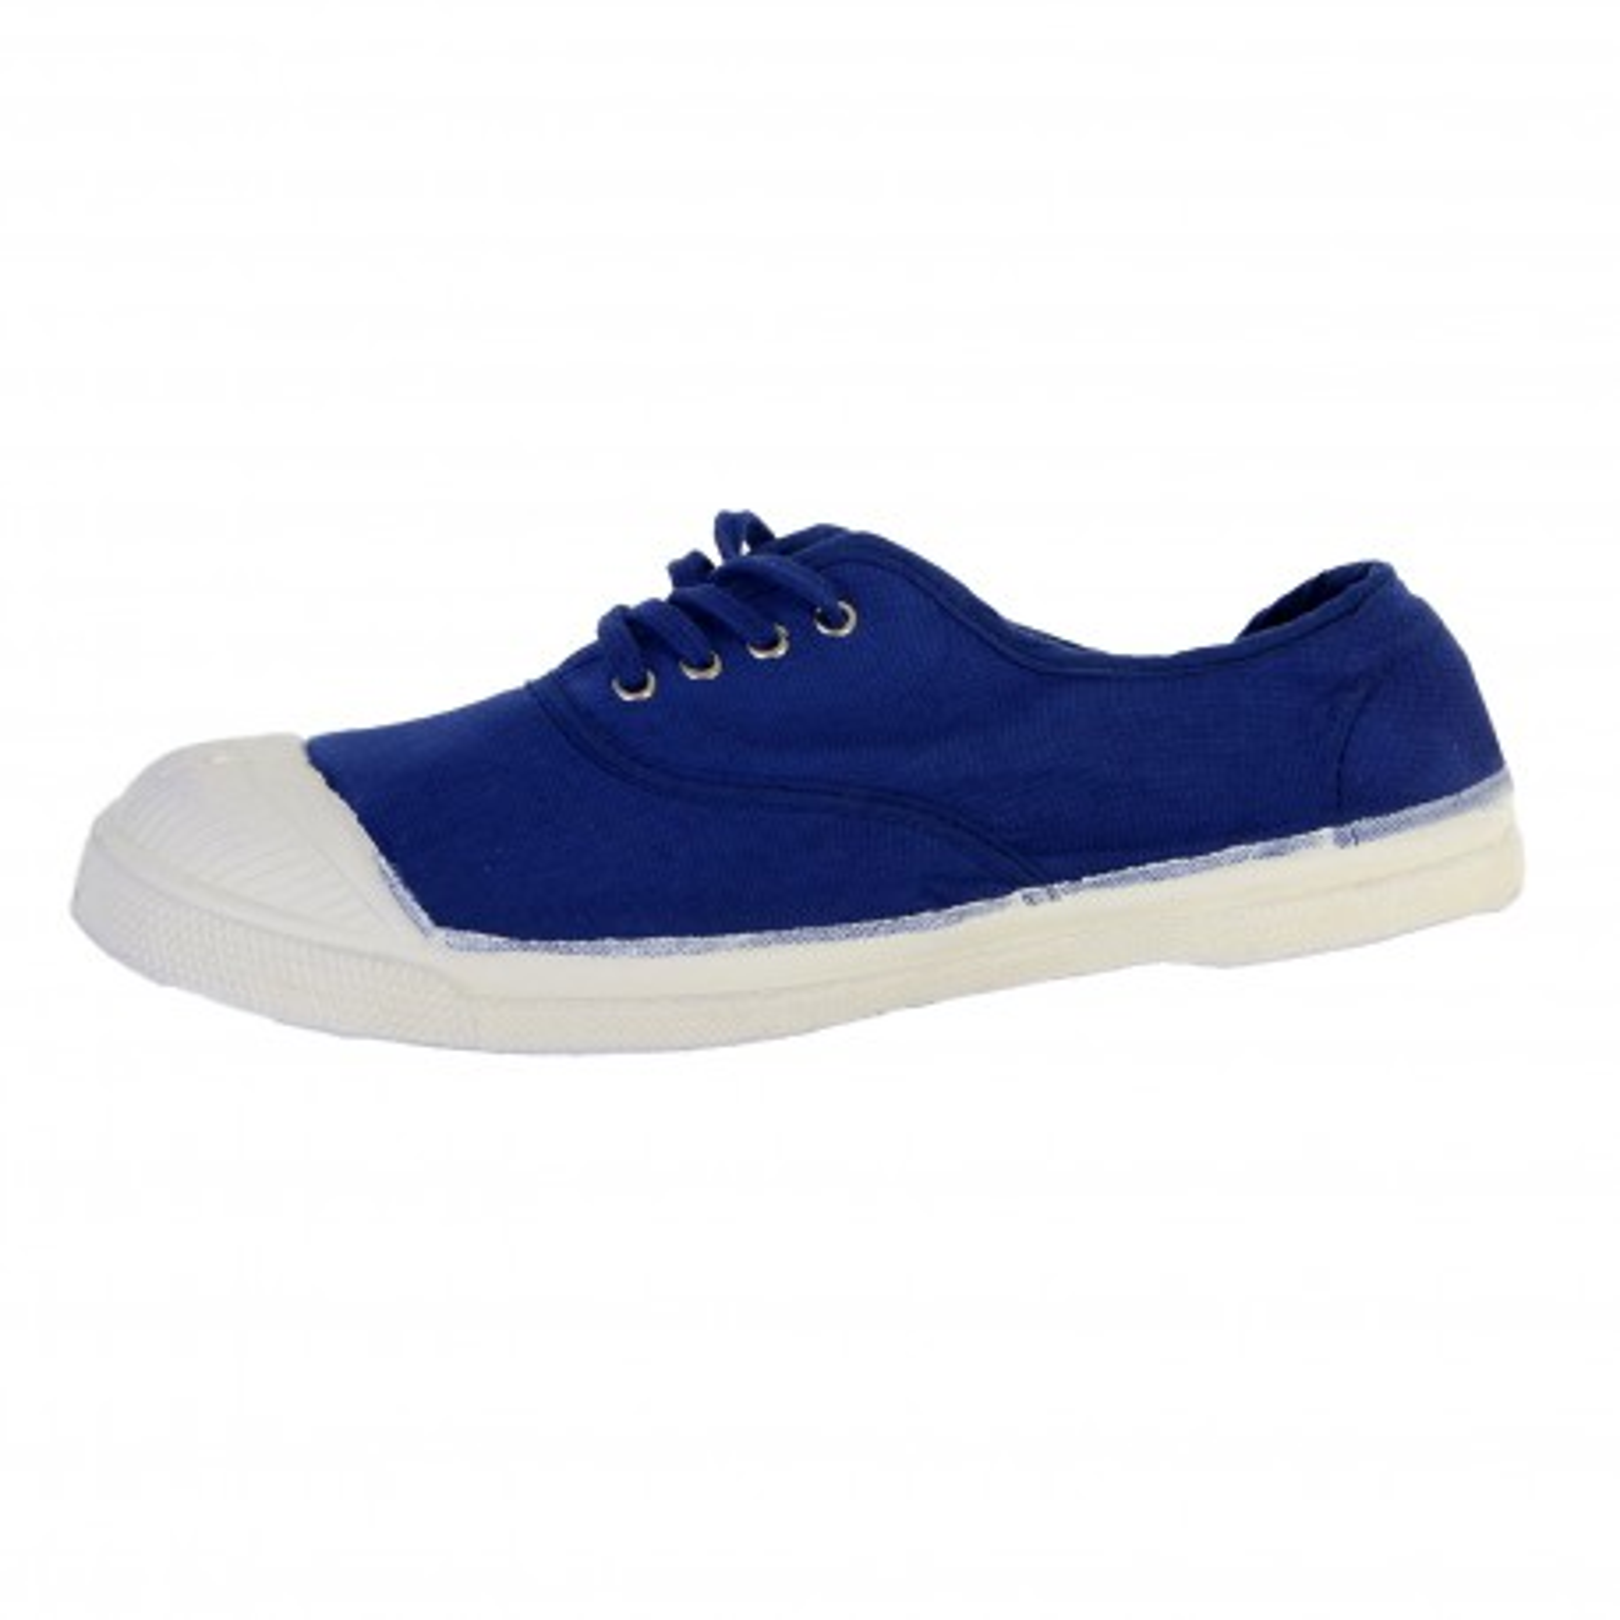 6f007f376fdfaf Tennis Bensimon Lacet Femme Bleu Vif - Galerie-Chic